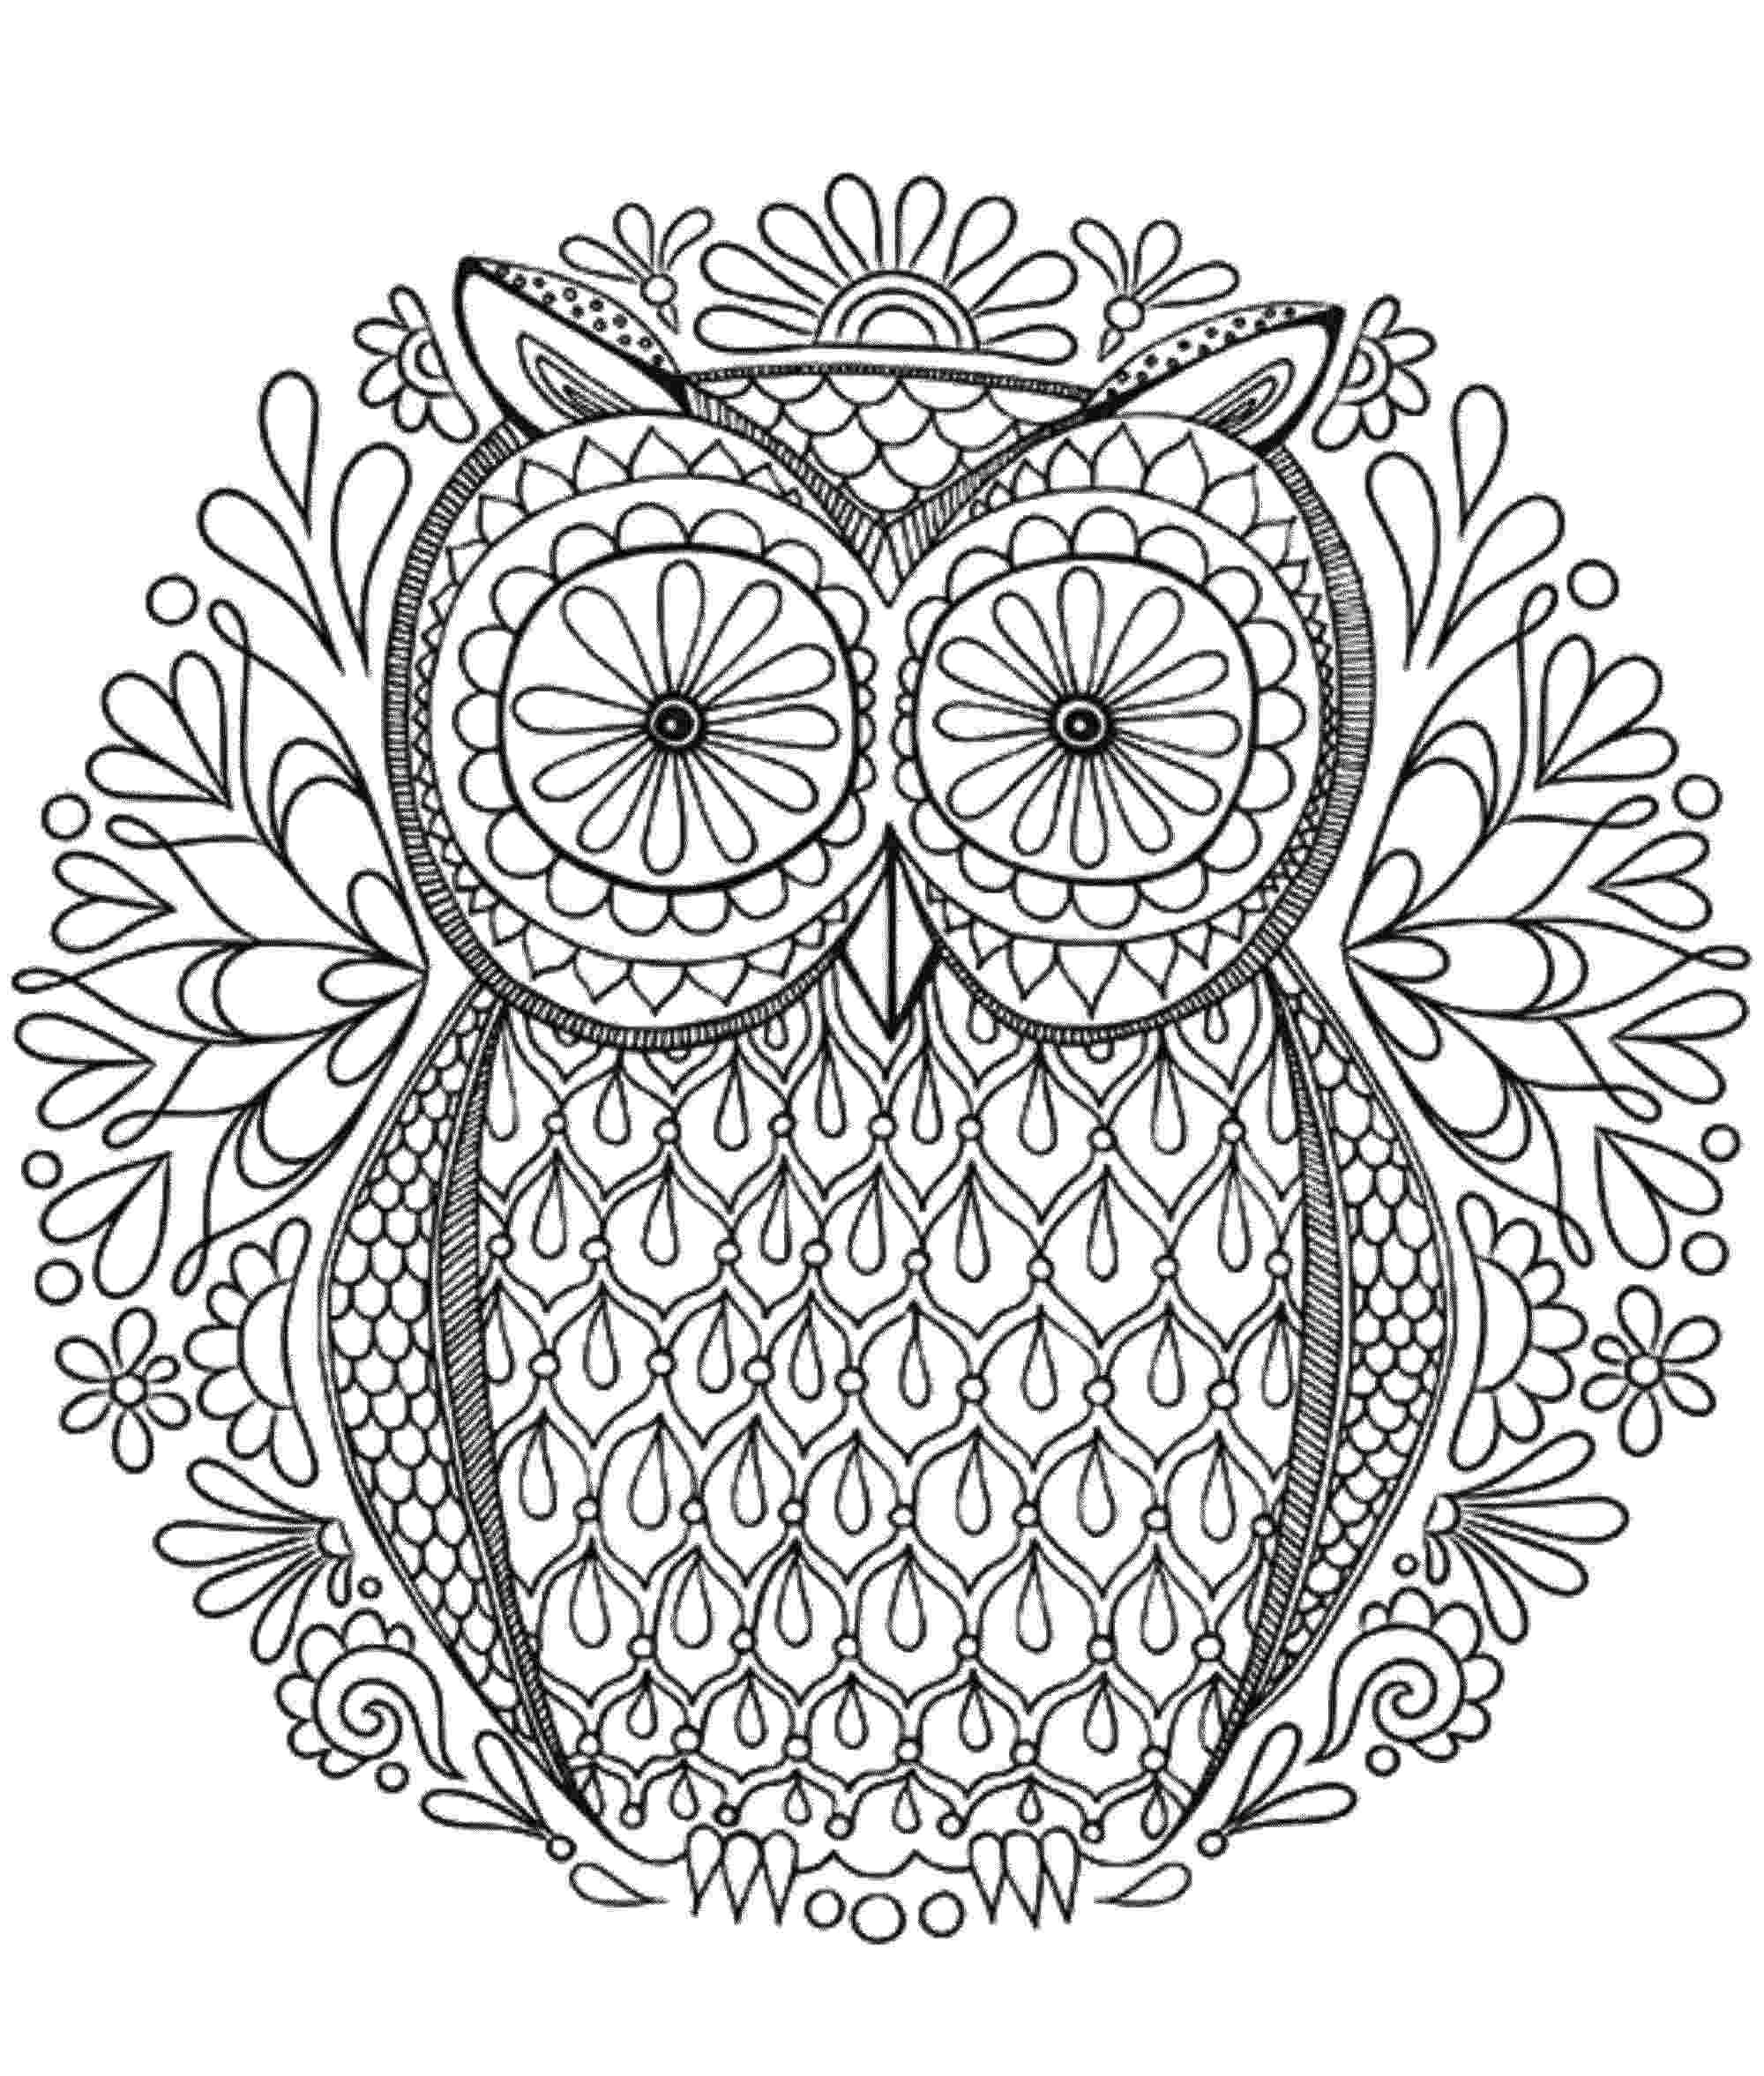 coloring pages for adults mandala mandala to download in pdf 6 malas adult coloring pages mandala coloring for adults pages